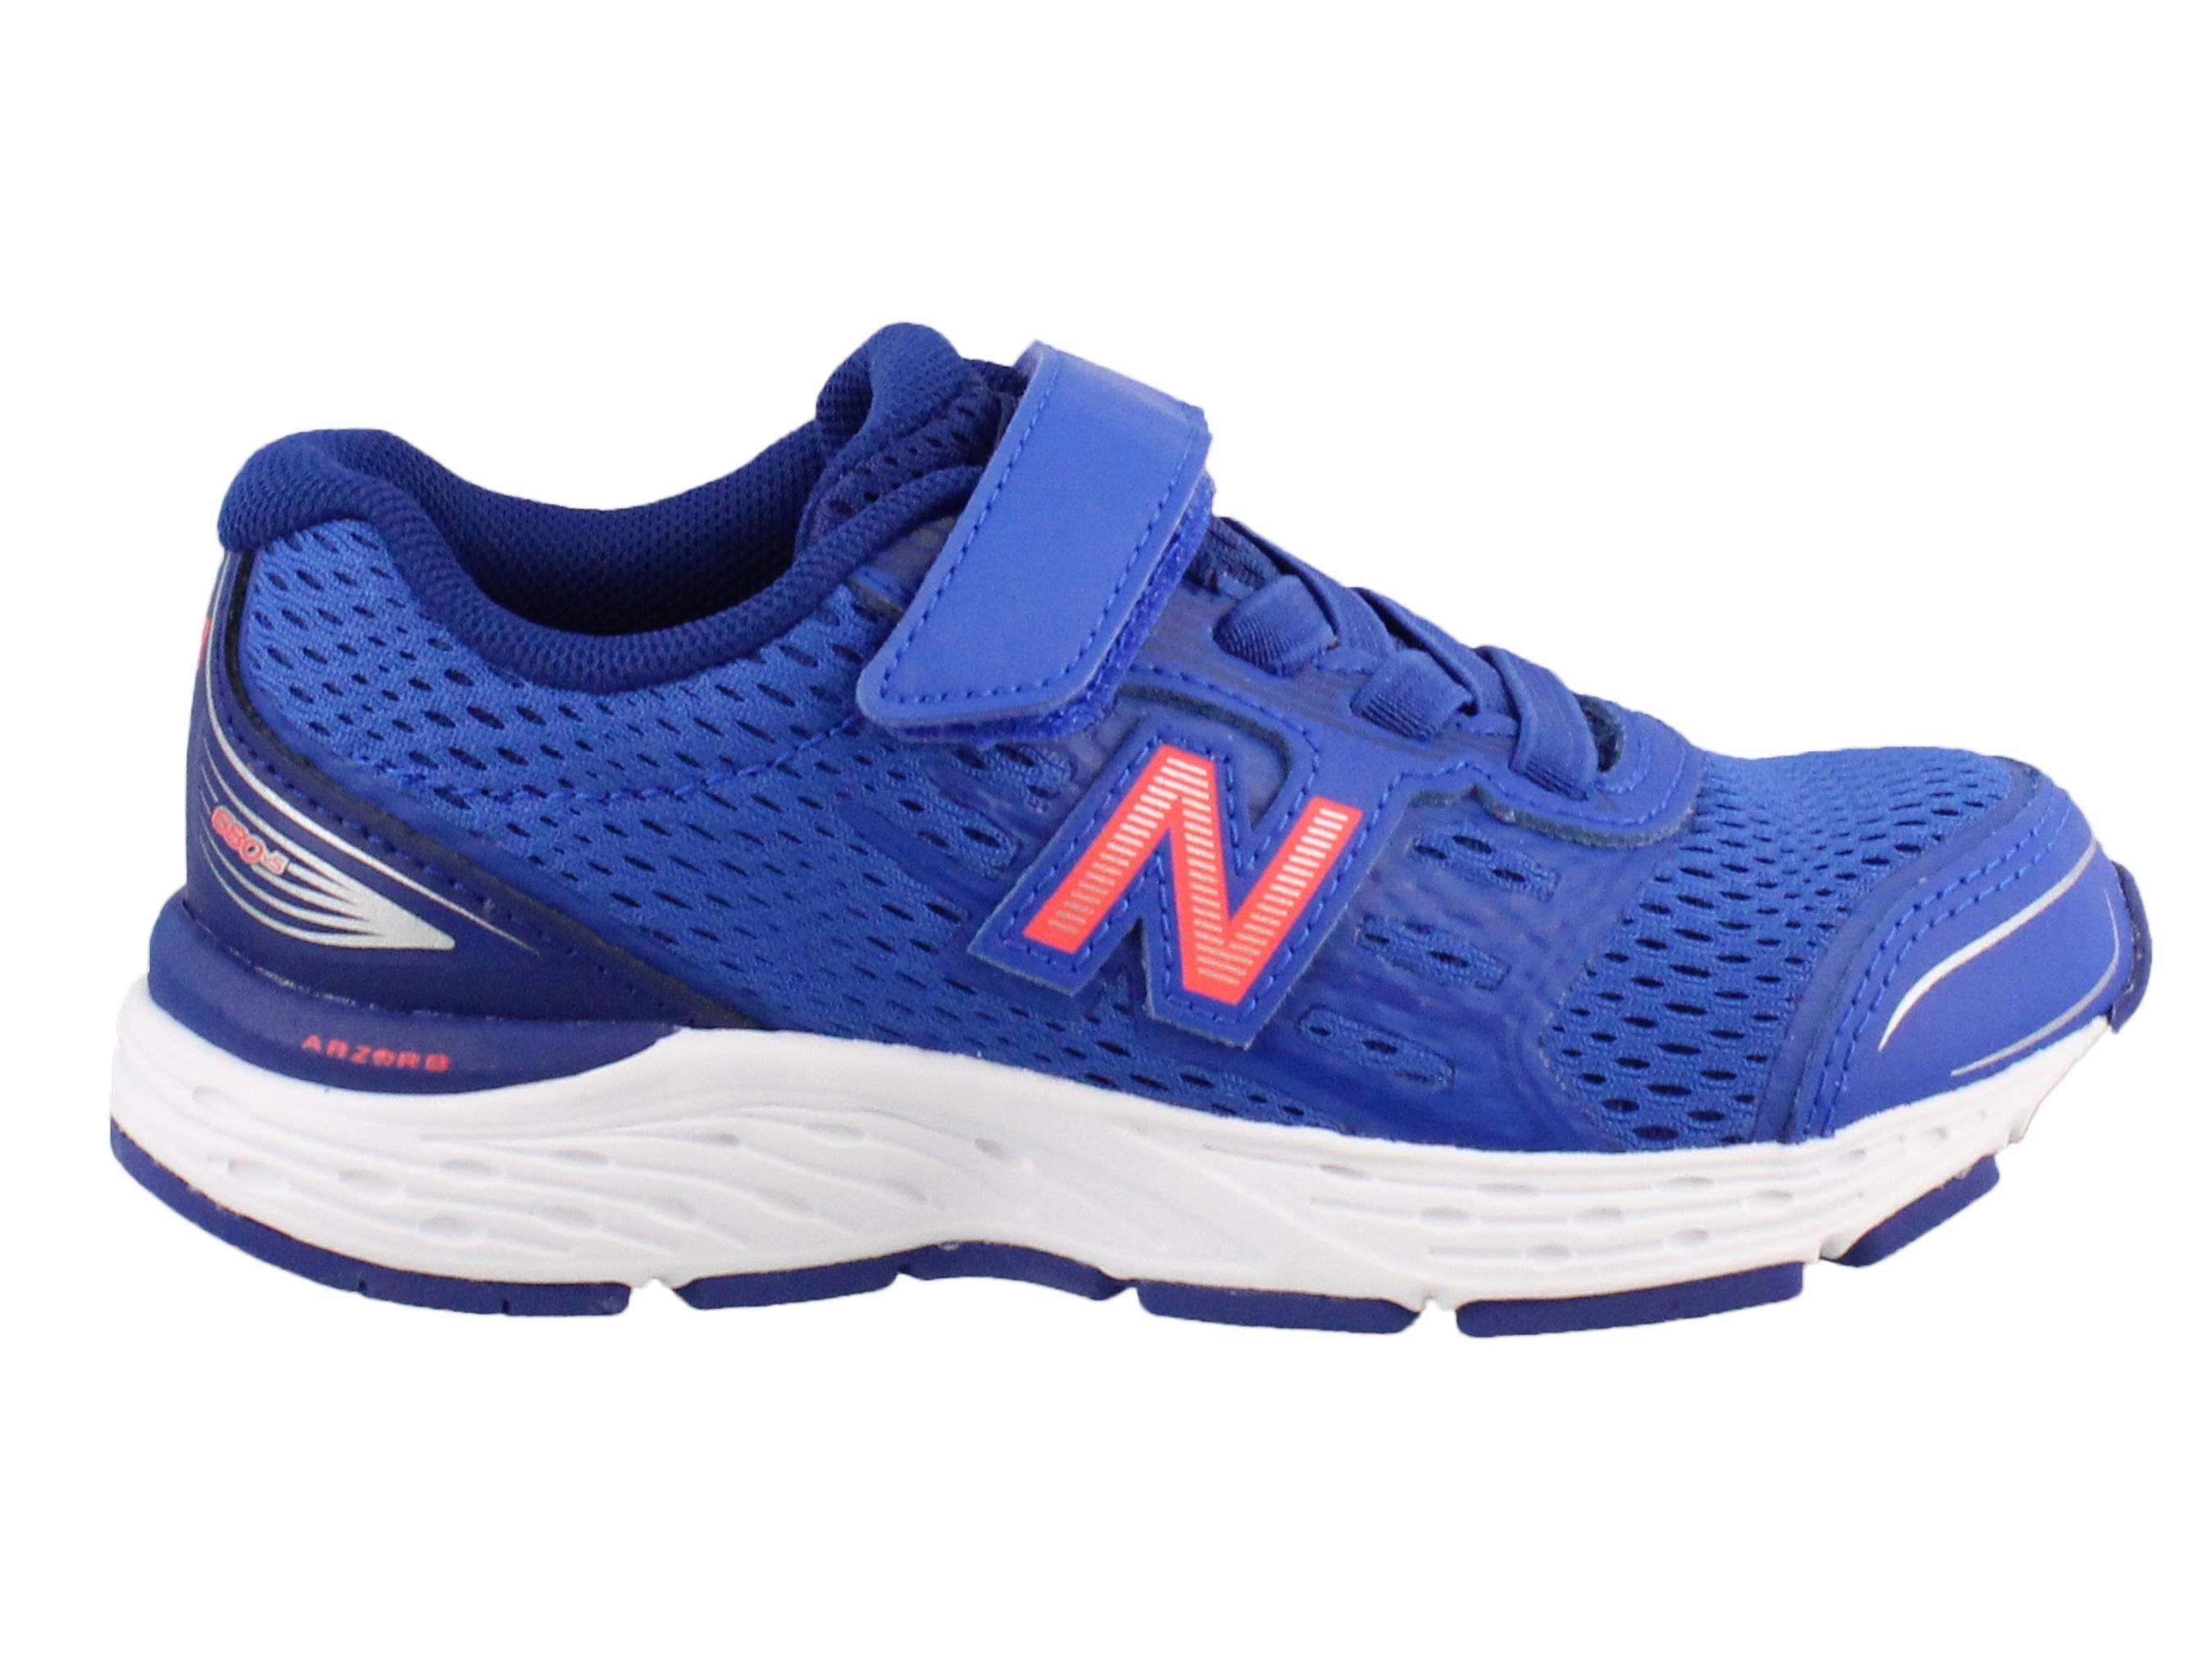 5174aaacfd21f ... wide running shoes size f39bb 74425; switzerland new balance girls  ka680pdy low top lace up running sneaker blue size 7 kids walmart